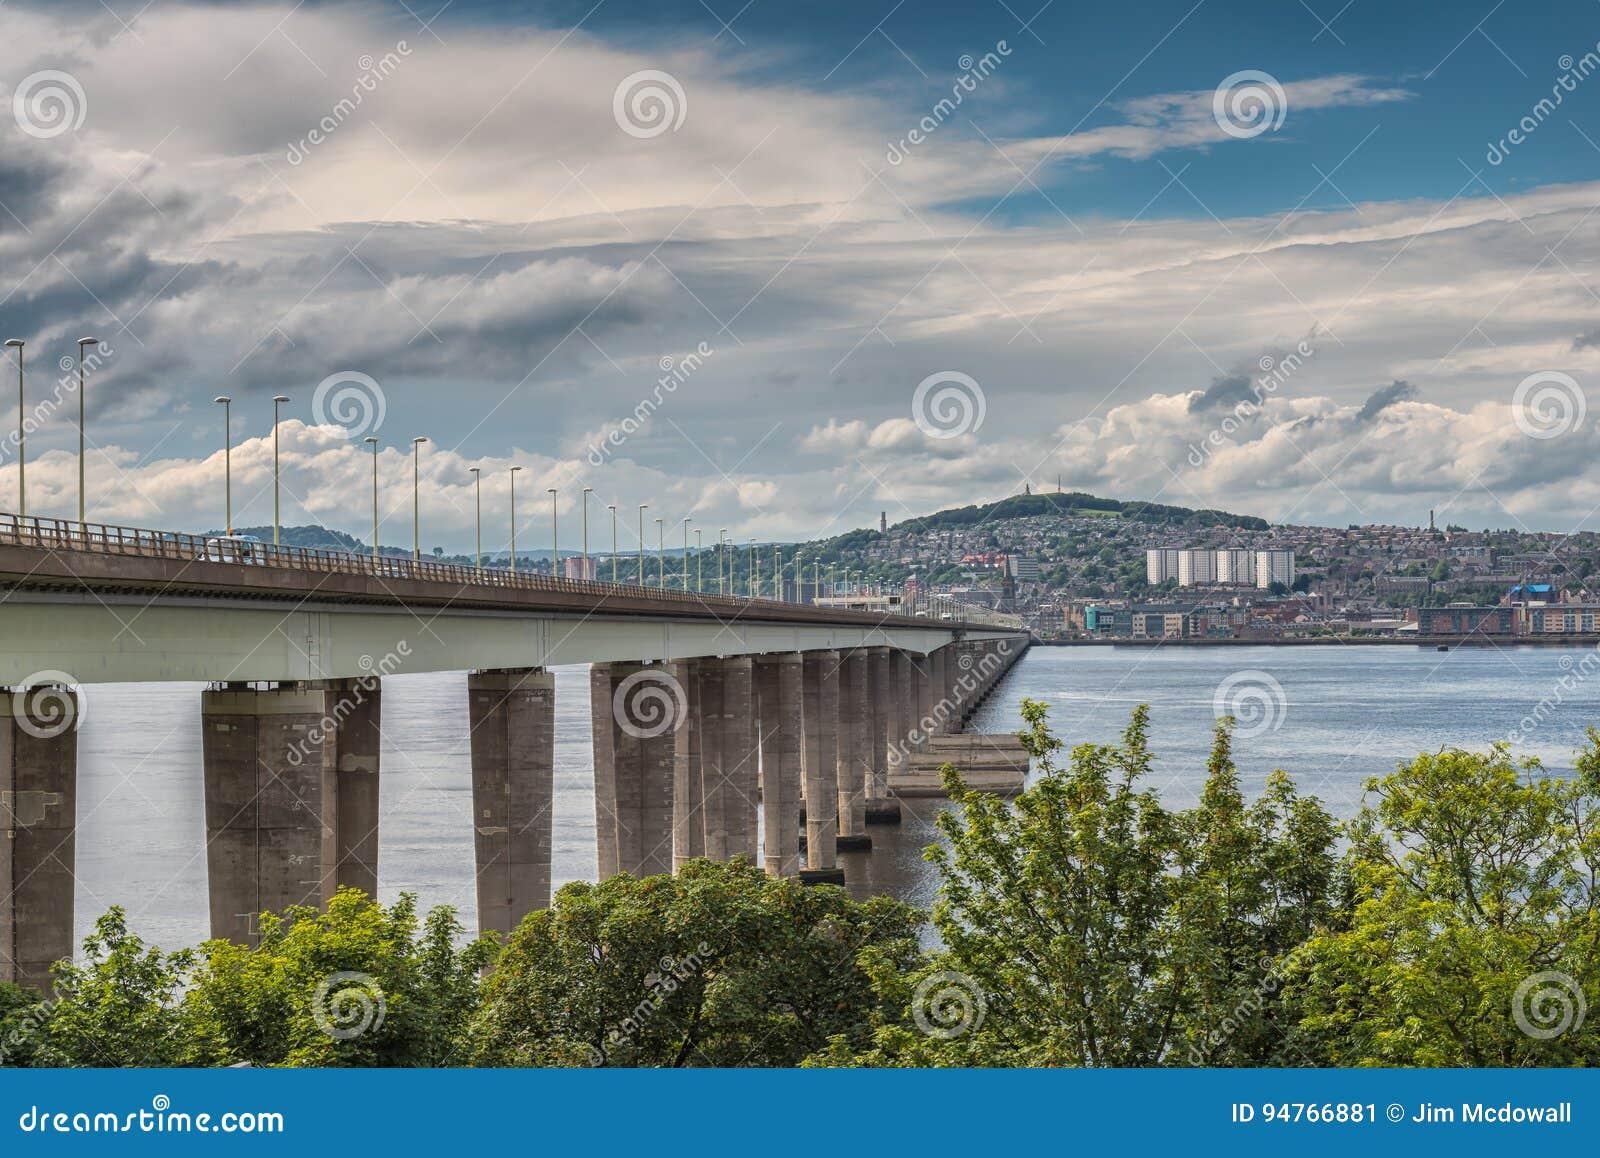 Tay Bridge Dundee Scotland